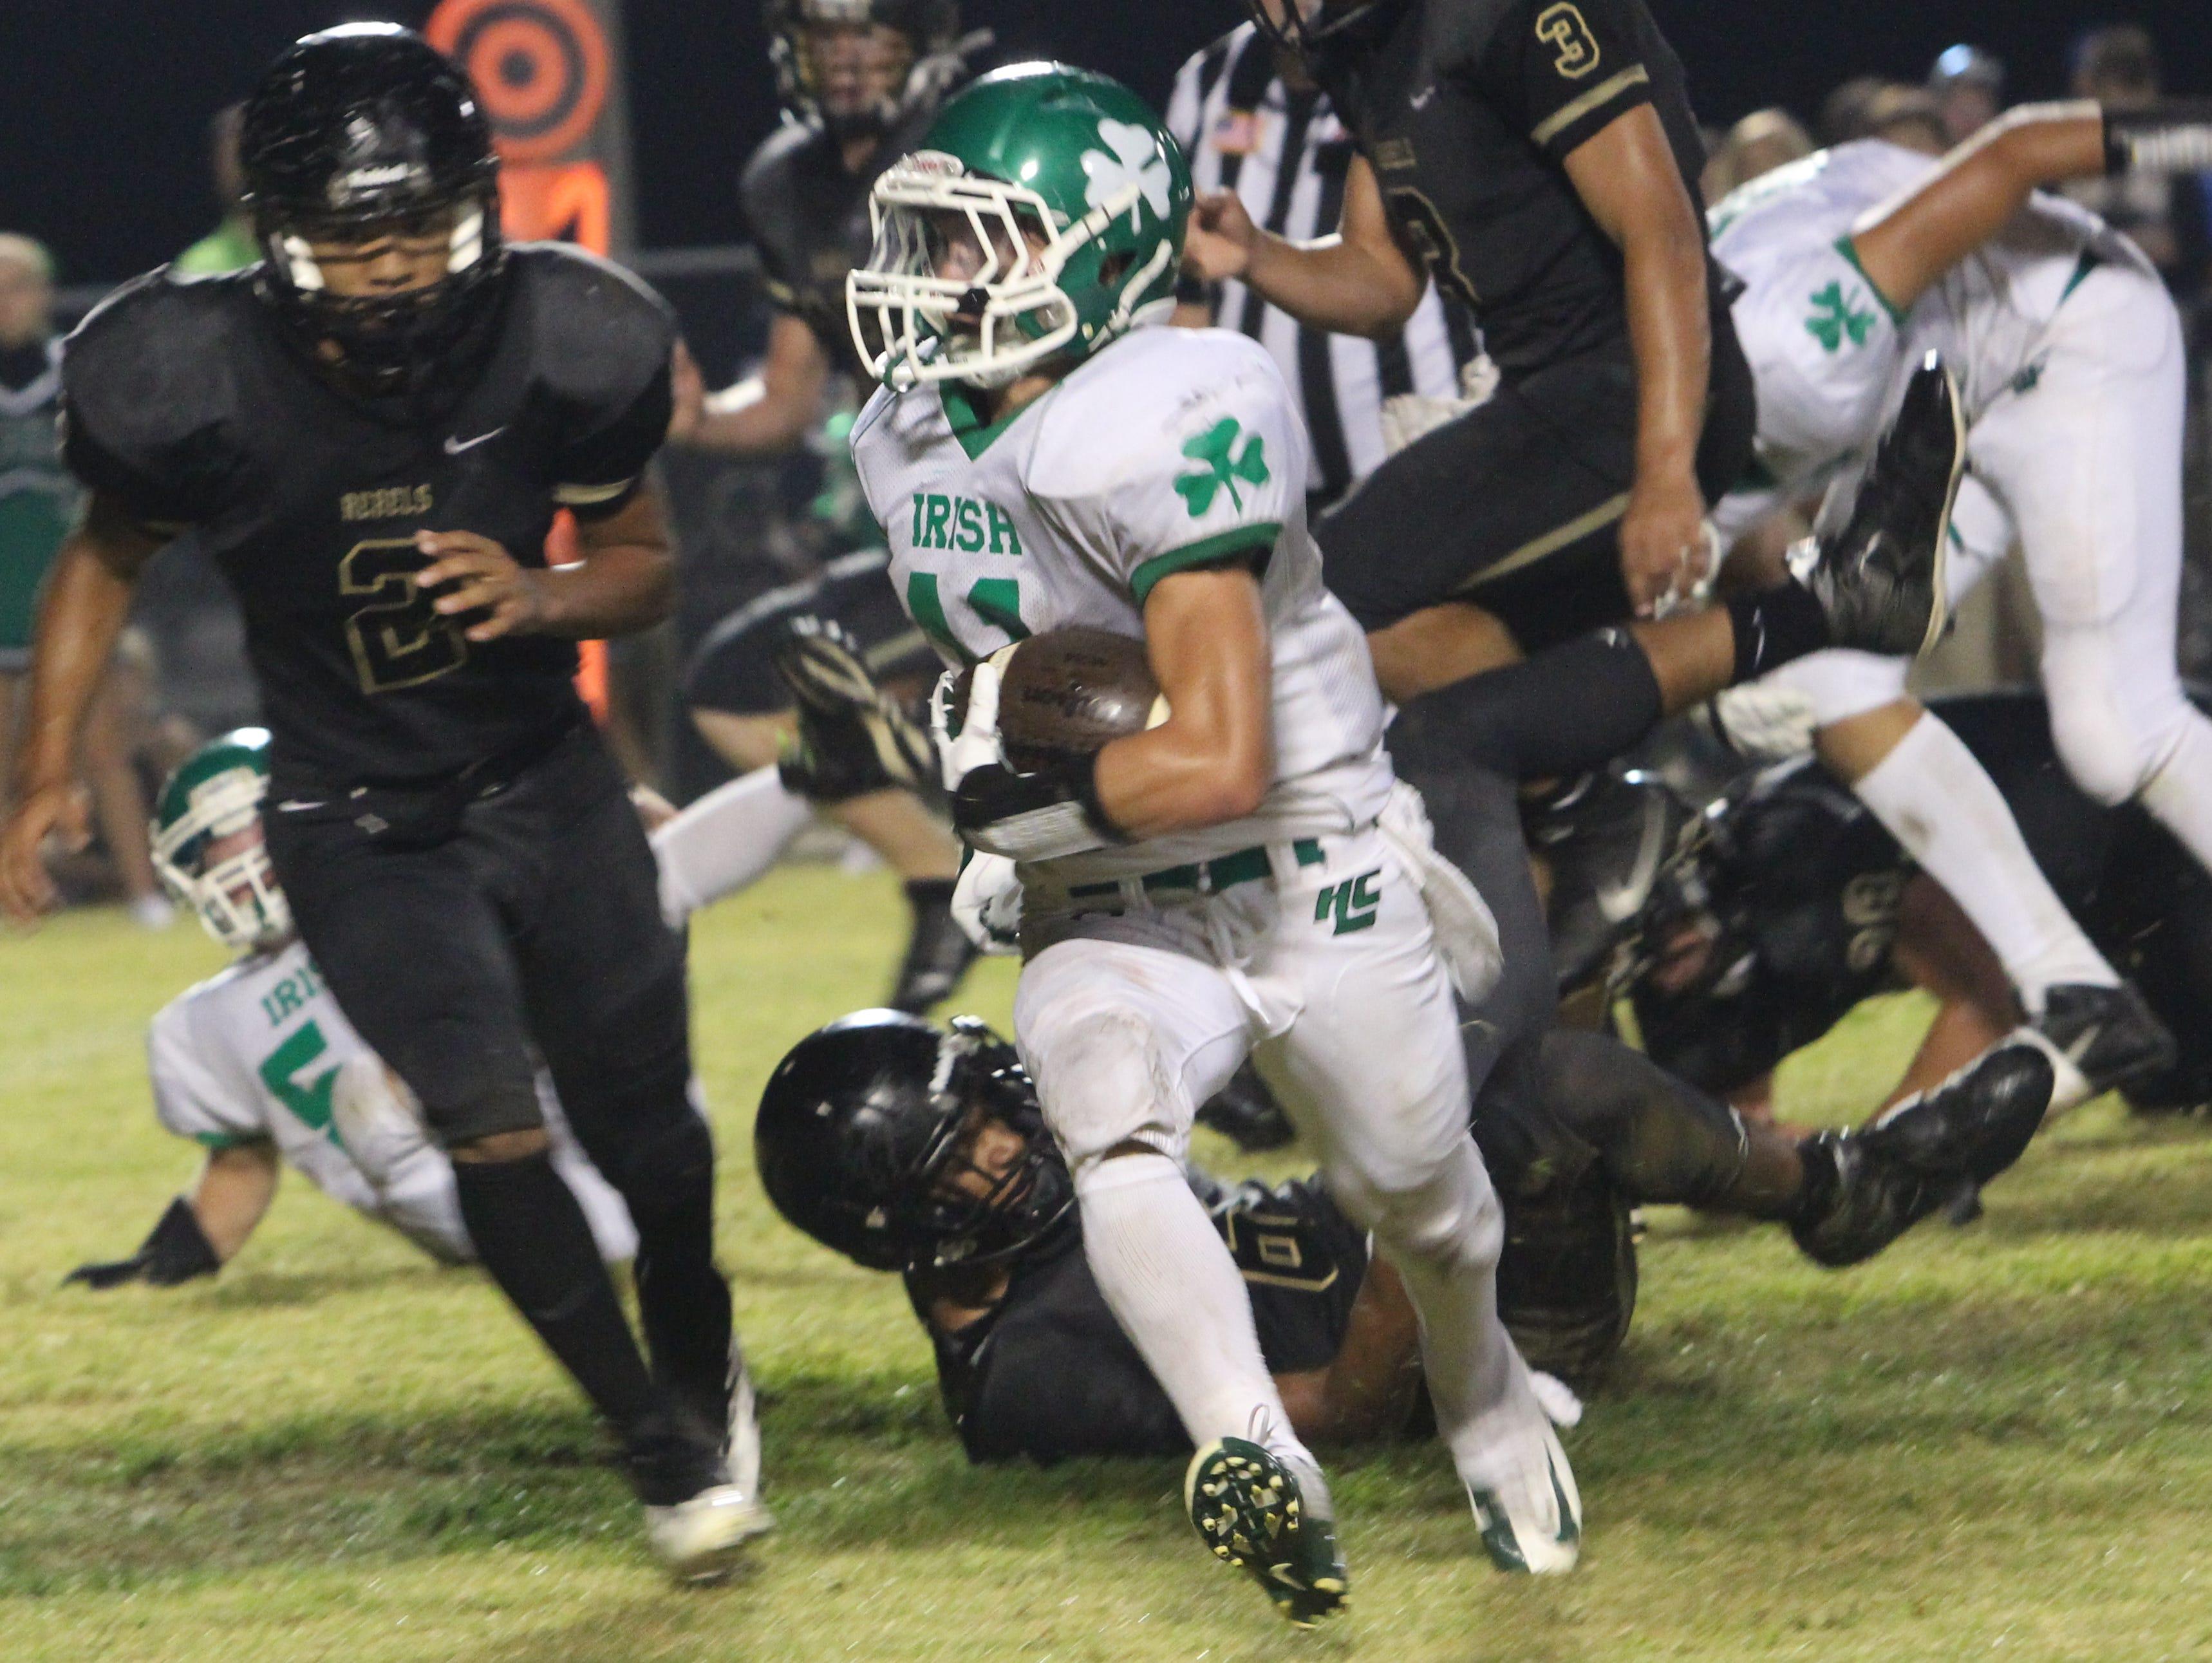 Houston County's Nolas Seay runs the ball against rival Stewart County earlier this season.